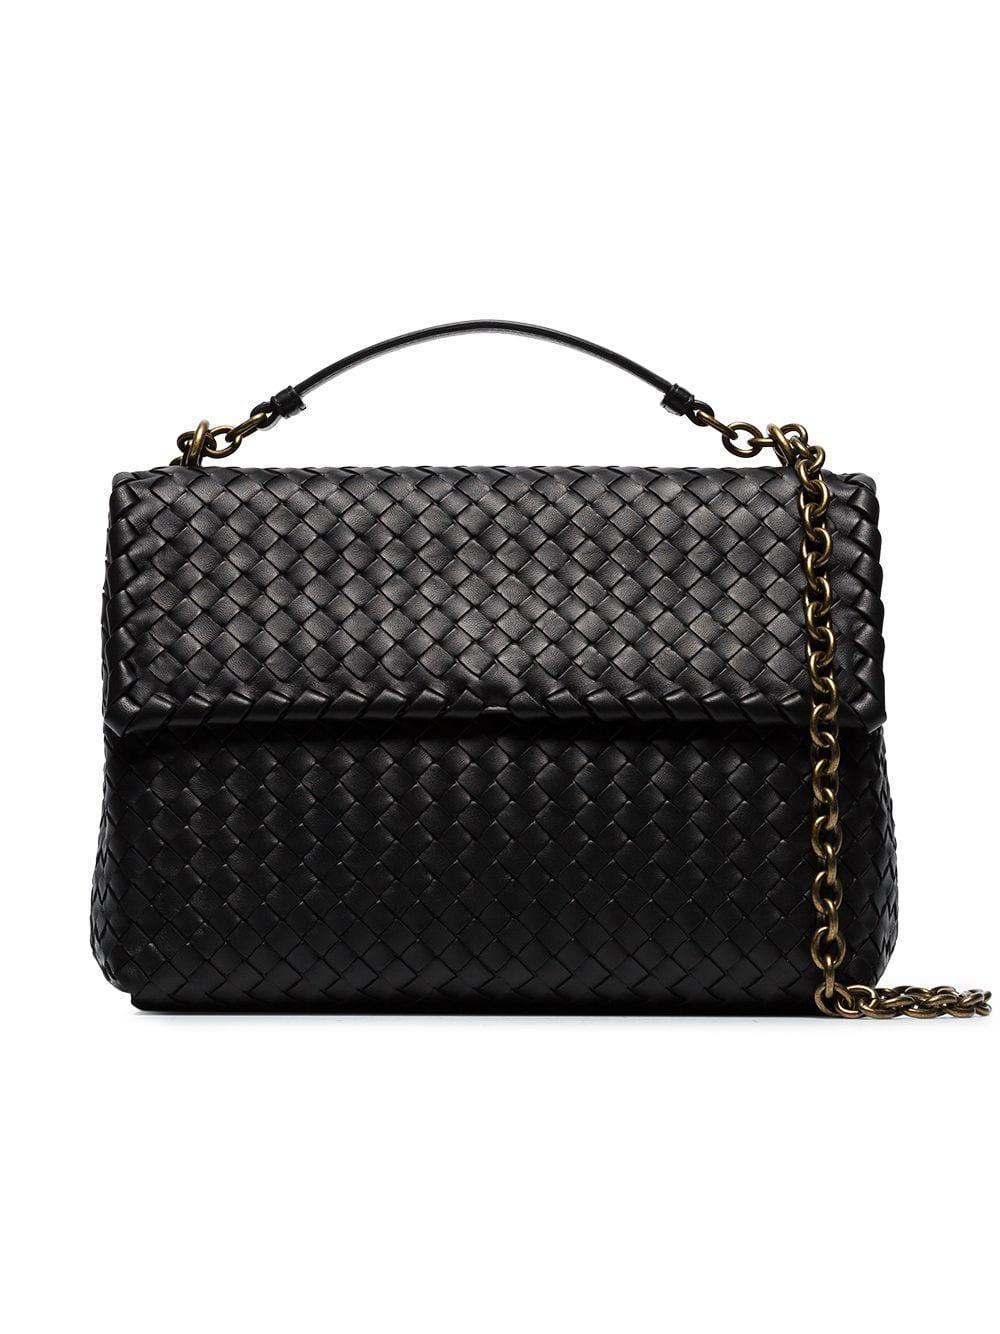 4e5b01aaa677 BOTTEGA VENETA. Bottega Veneta Black Olympia Intrecciato Leather Shoulder  Bag